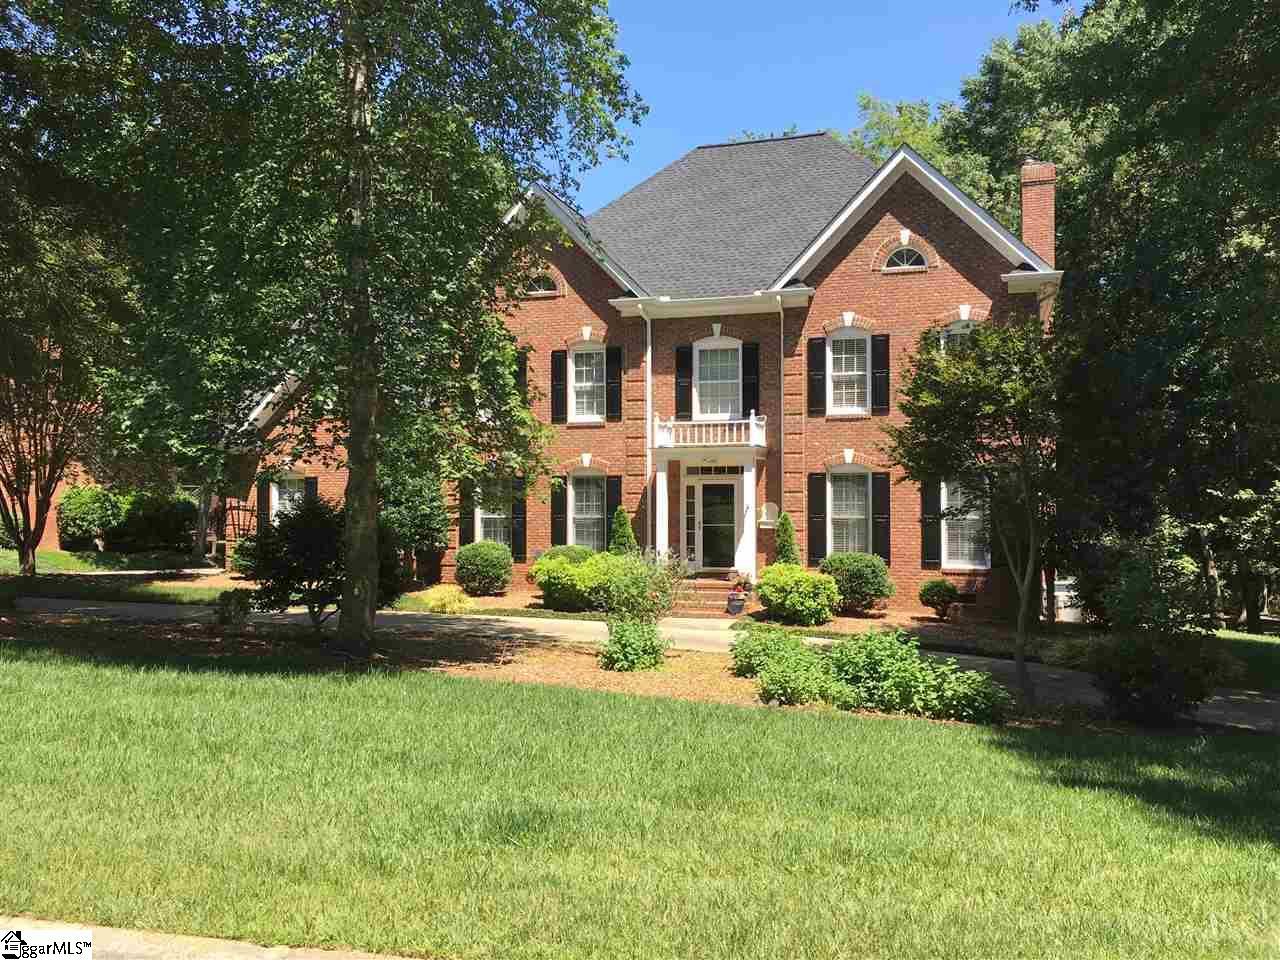 109 Hidden Oak Terrace, Simpsonville, SC 29681